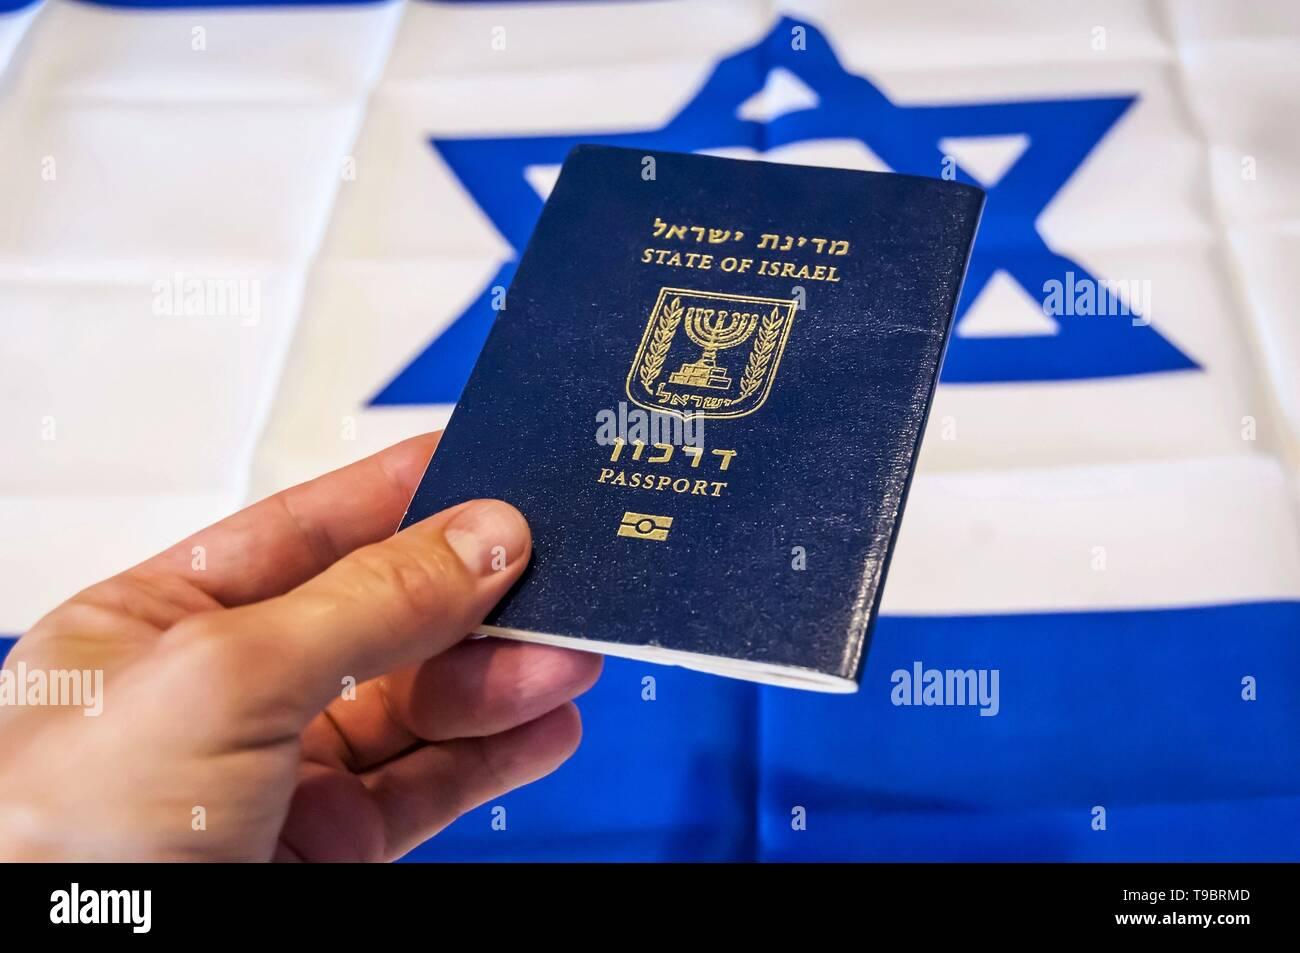 "Hand holding the passport of the State of Israel, Israeli flag on the background. Israel citizenship concept, Israeli biometric ""darkon"" passport Stock Photo"